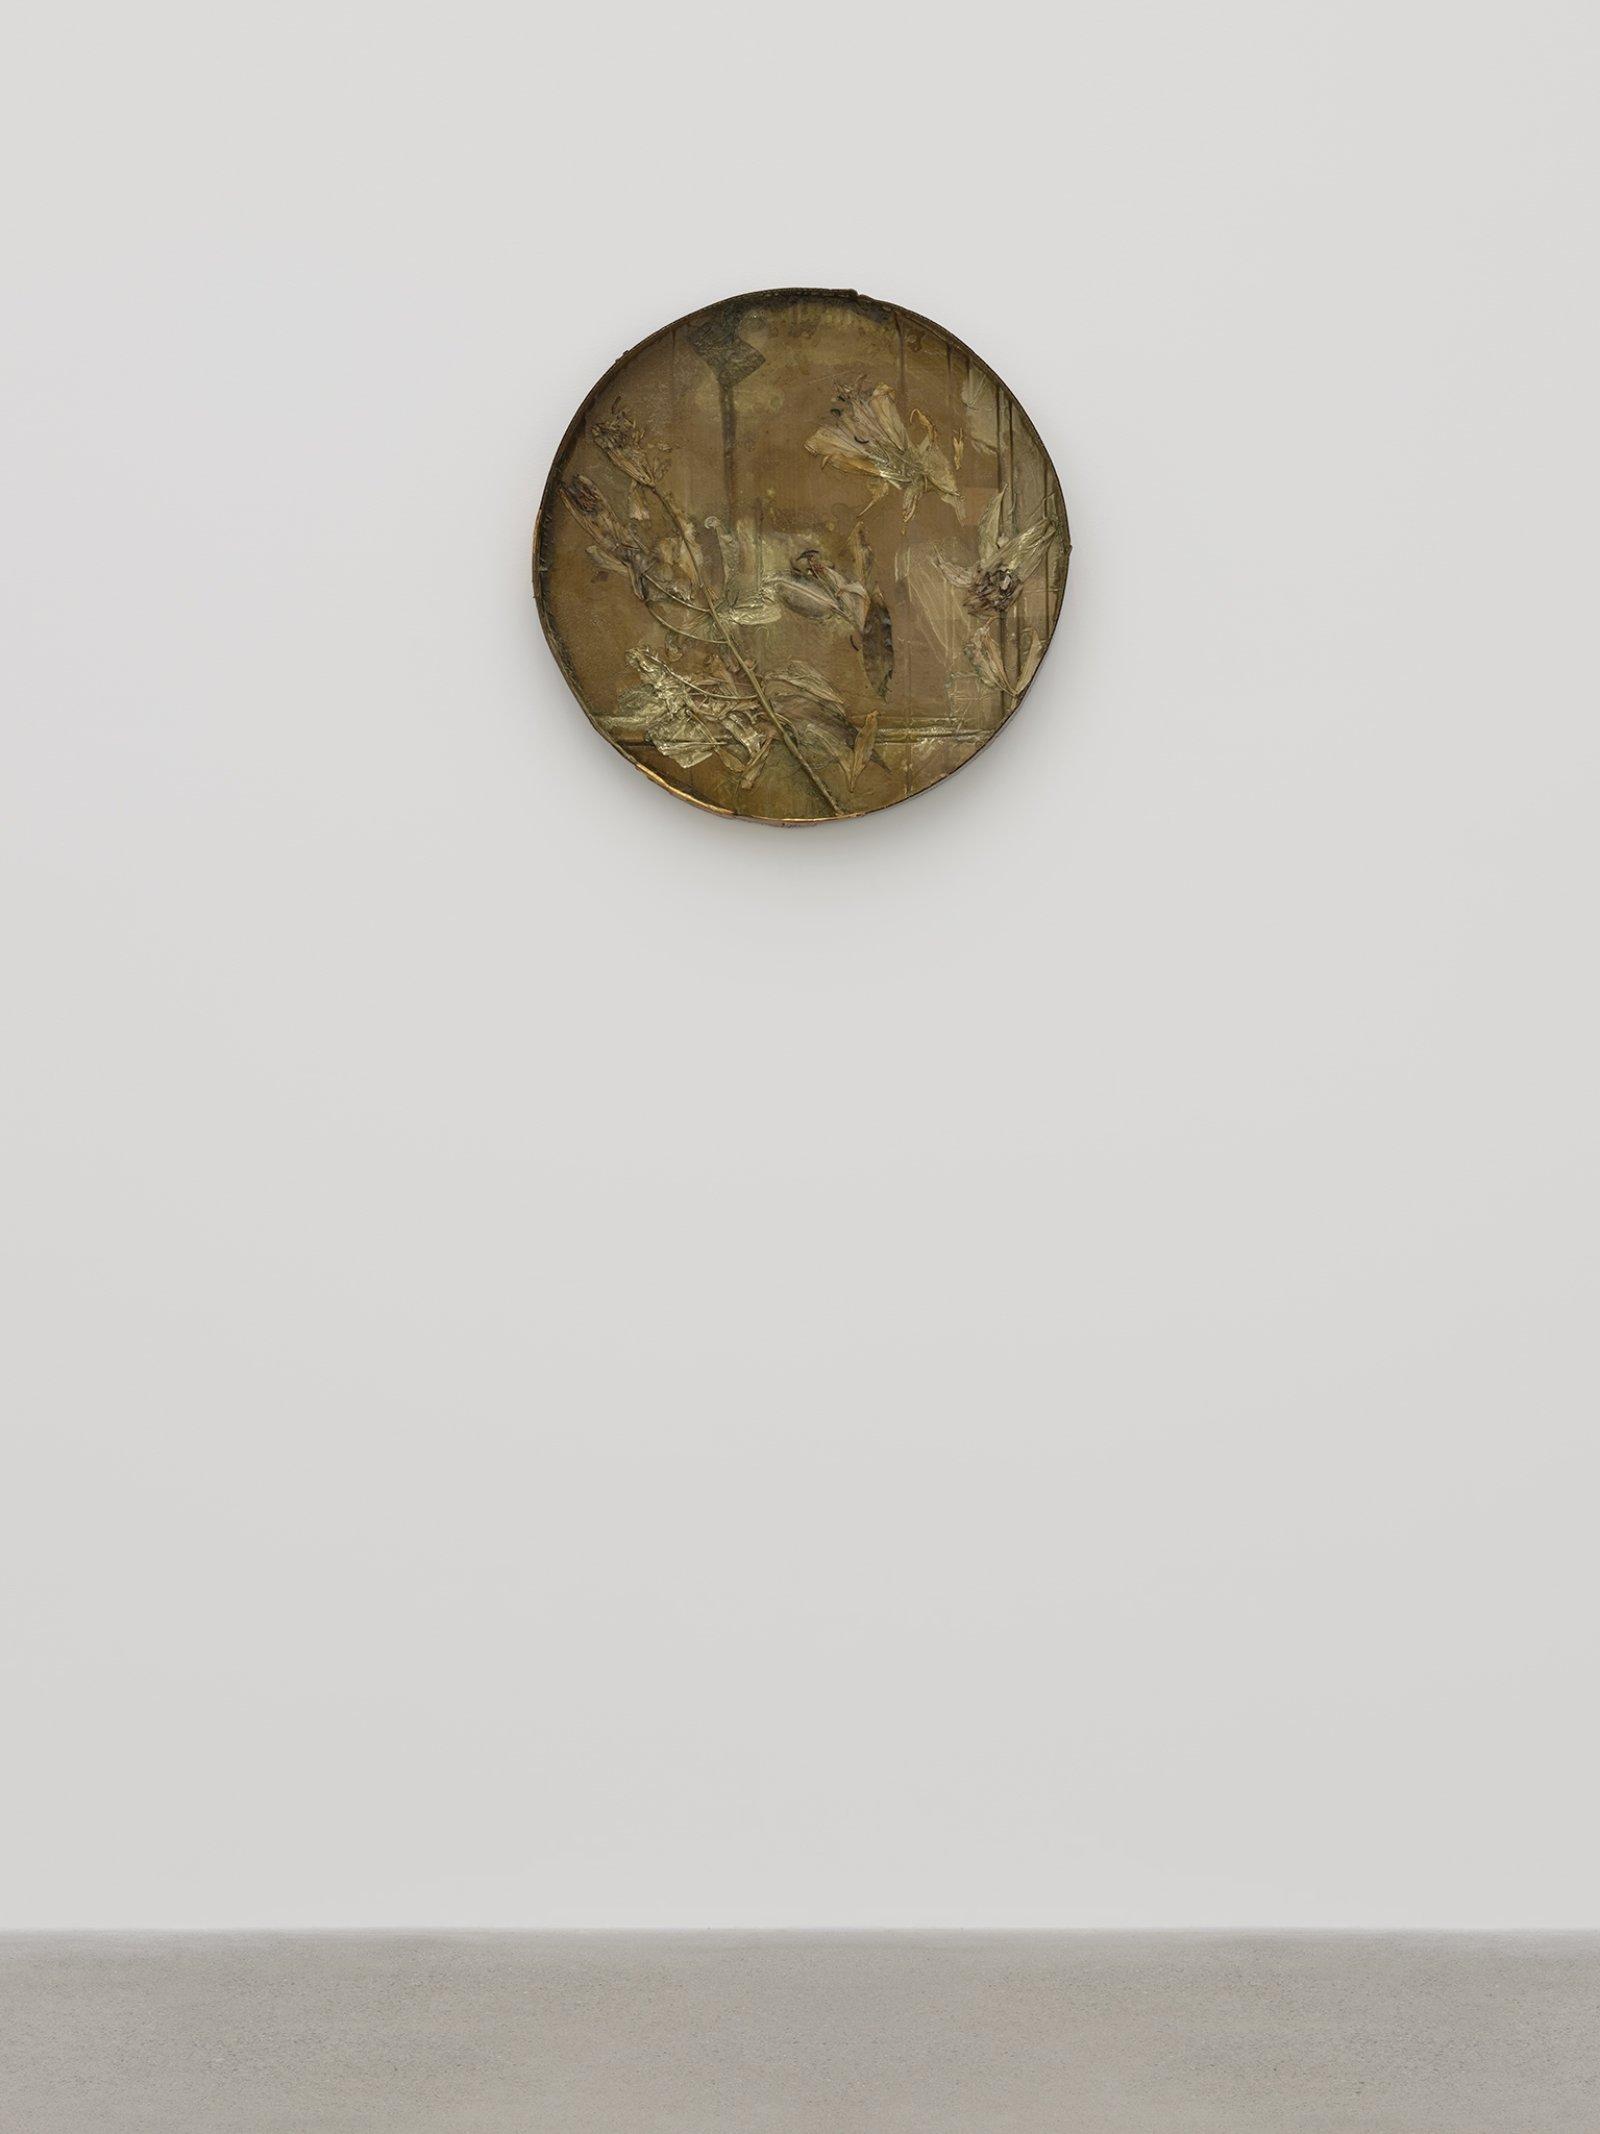 Rochelle Goldberg, Halo II, 2019, cardboard, tissue paper, lilies, shellac, gold pigment, gold tape, dirt, 27 x 27 x 3 in. (67 x 67 x 6 cm) by Rochelle Goldberg